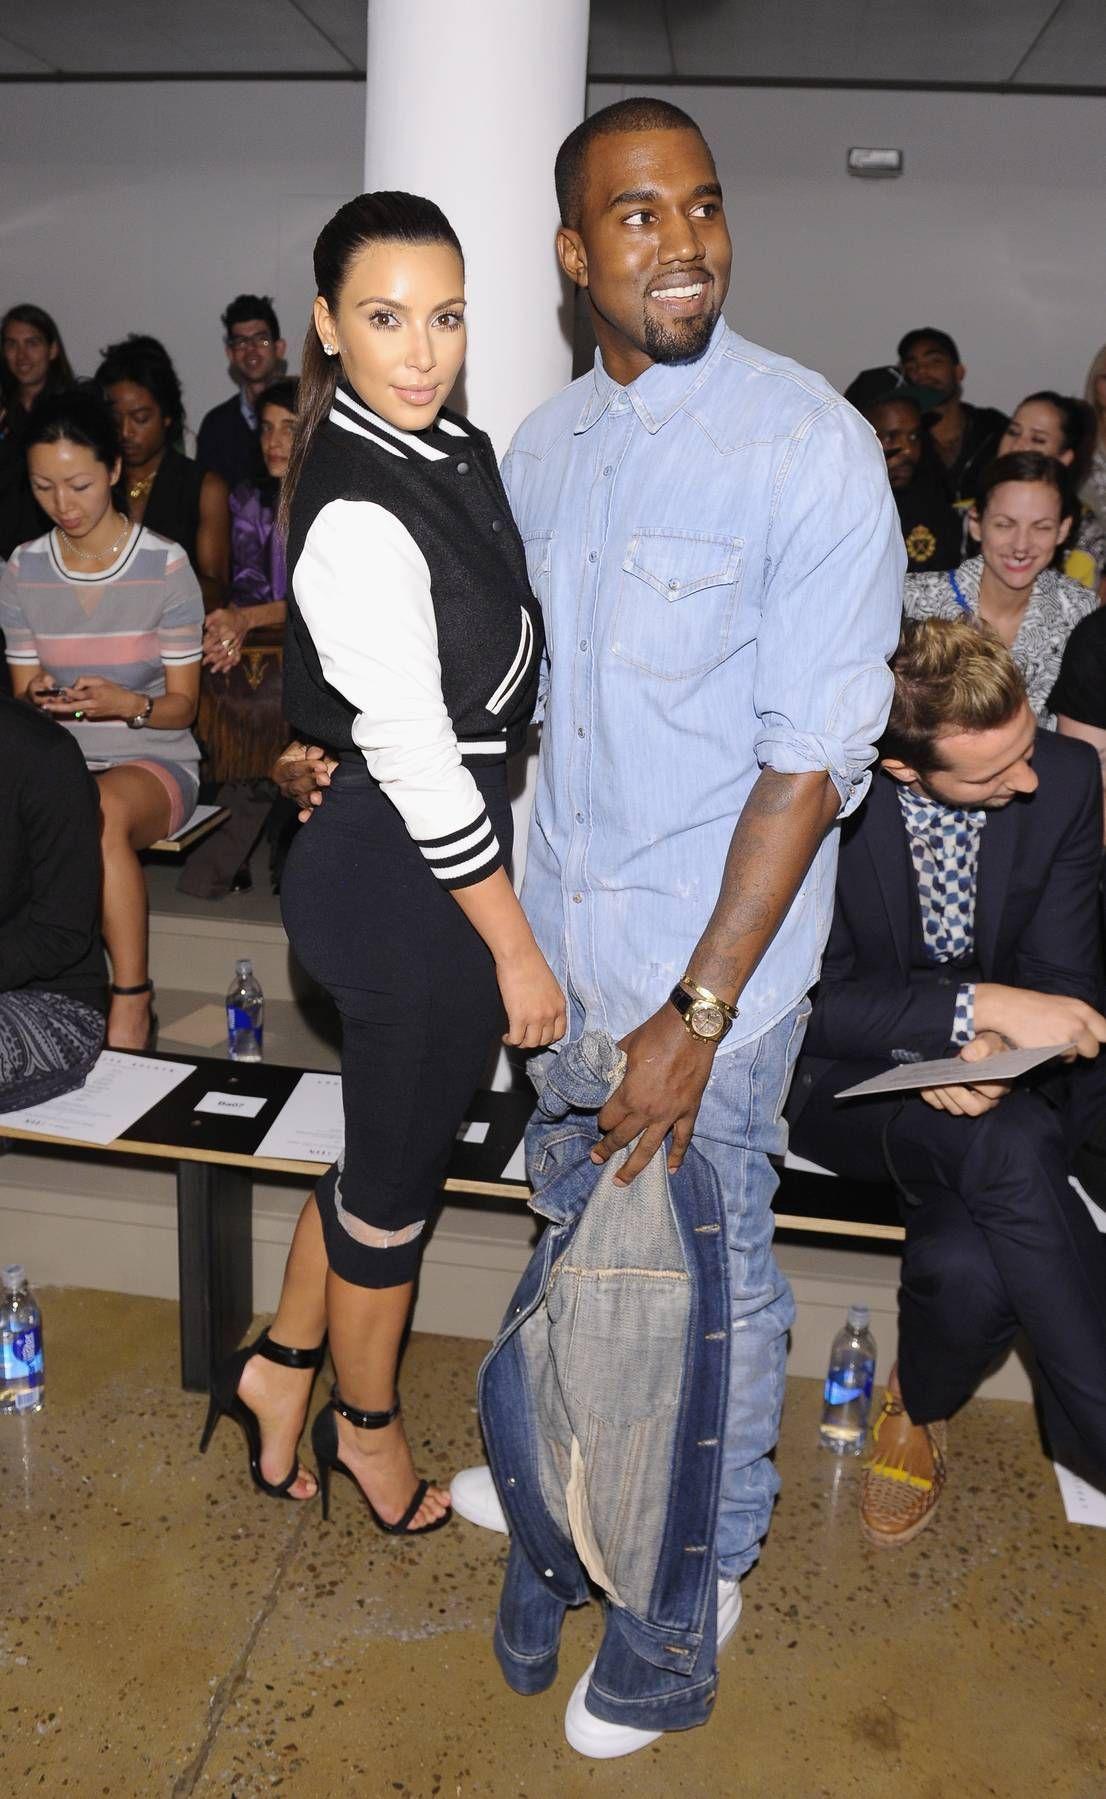 The Kanye West Look Book Kim Kardashian And Kanye Kim Kardashian Style Kim Kardashian Kanye West